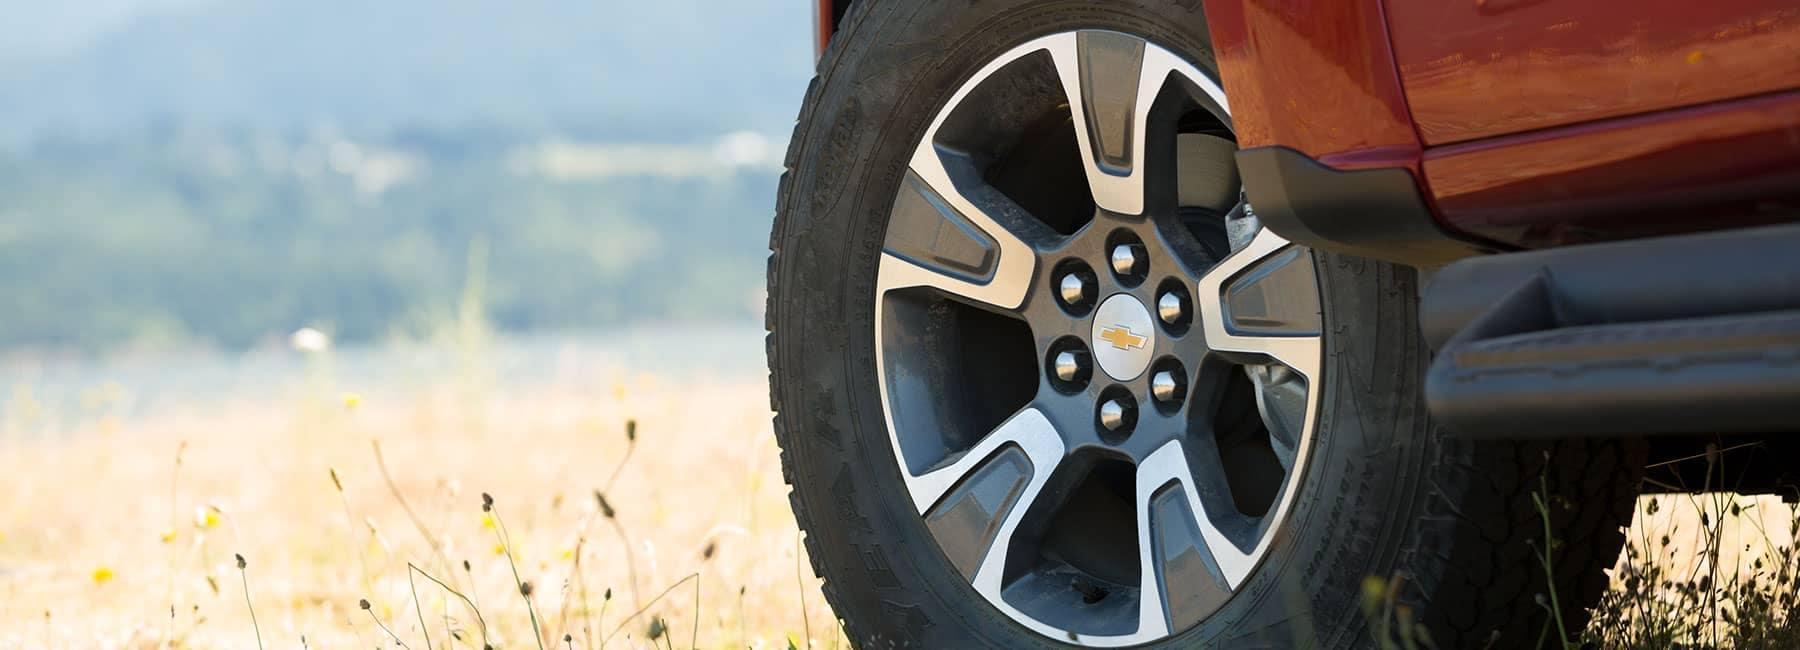 2019 Chevrolet wheel